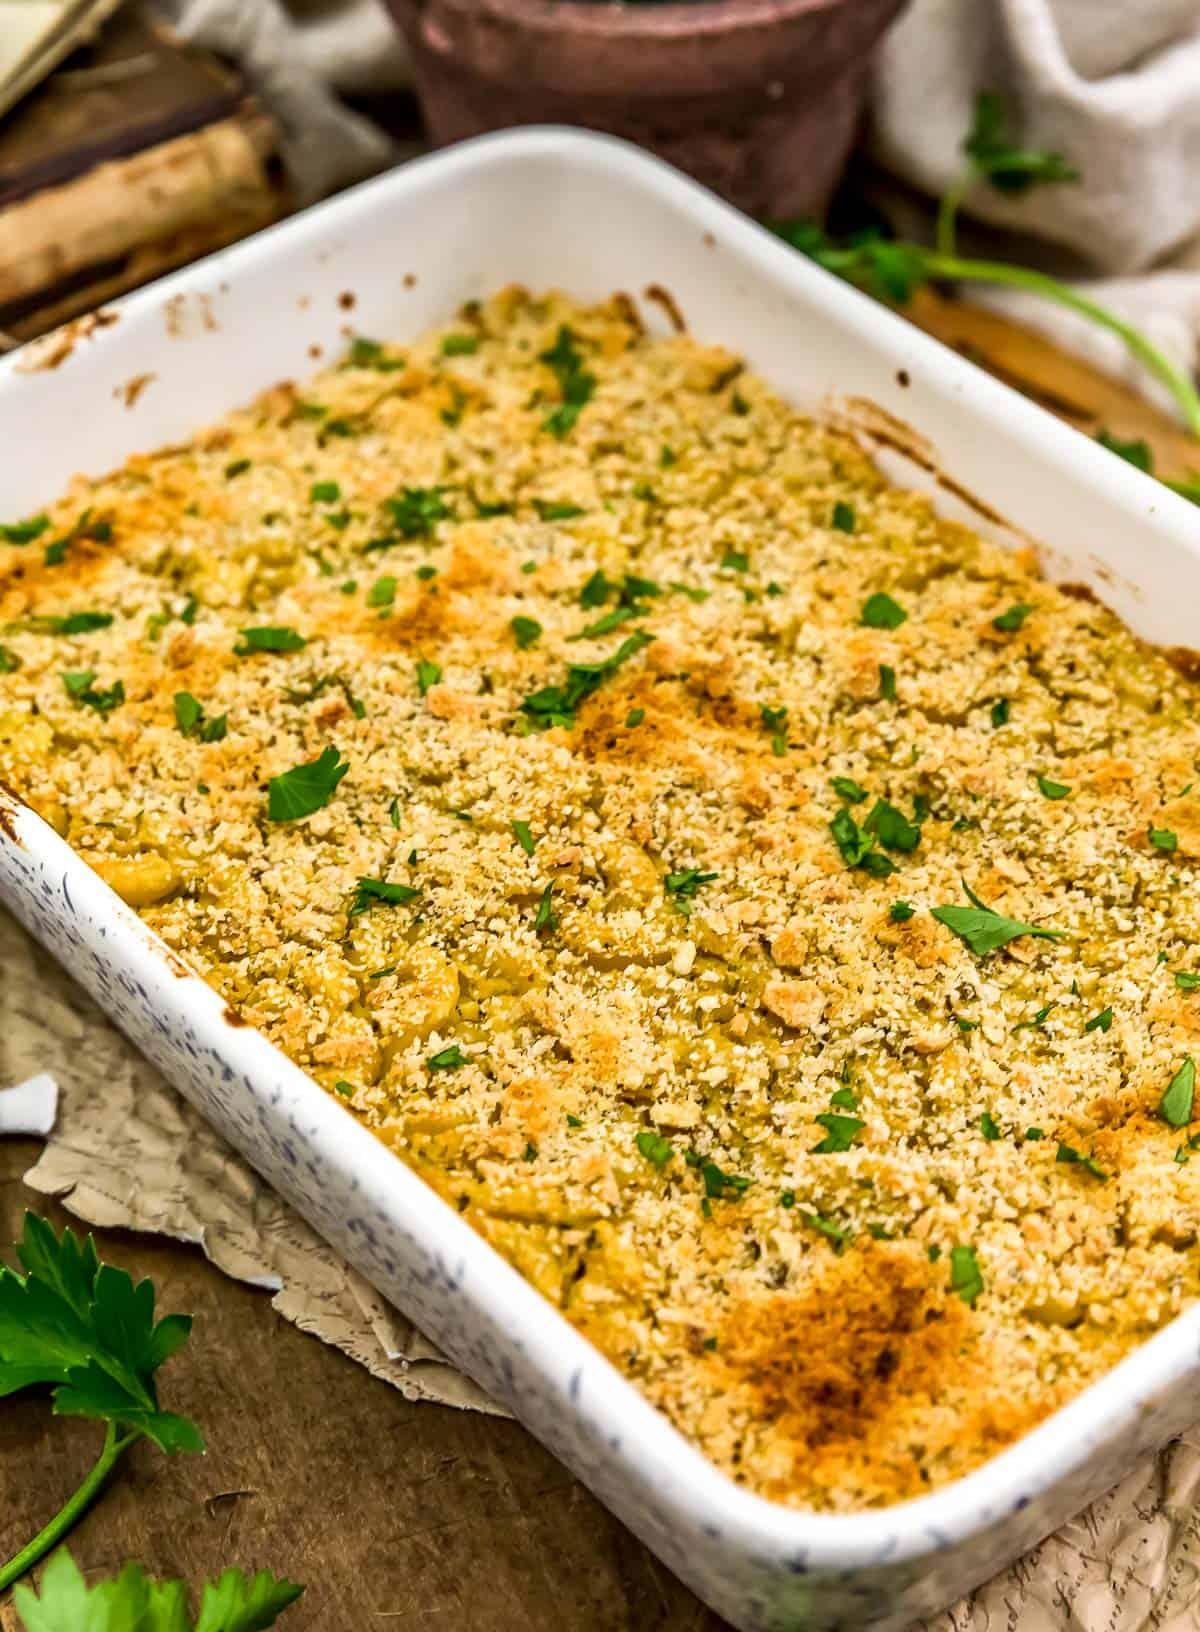 Baked Vegan Italian Parmesan Mac and Cheese